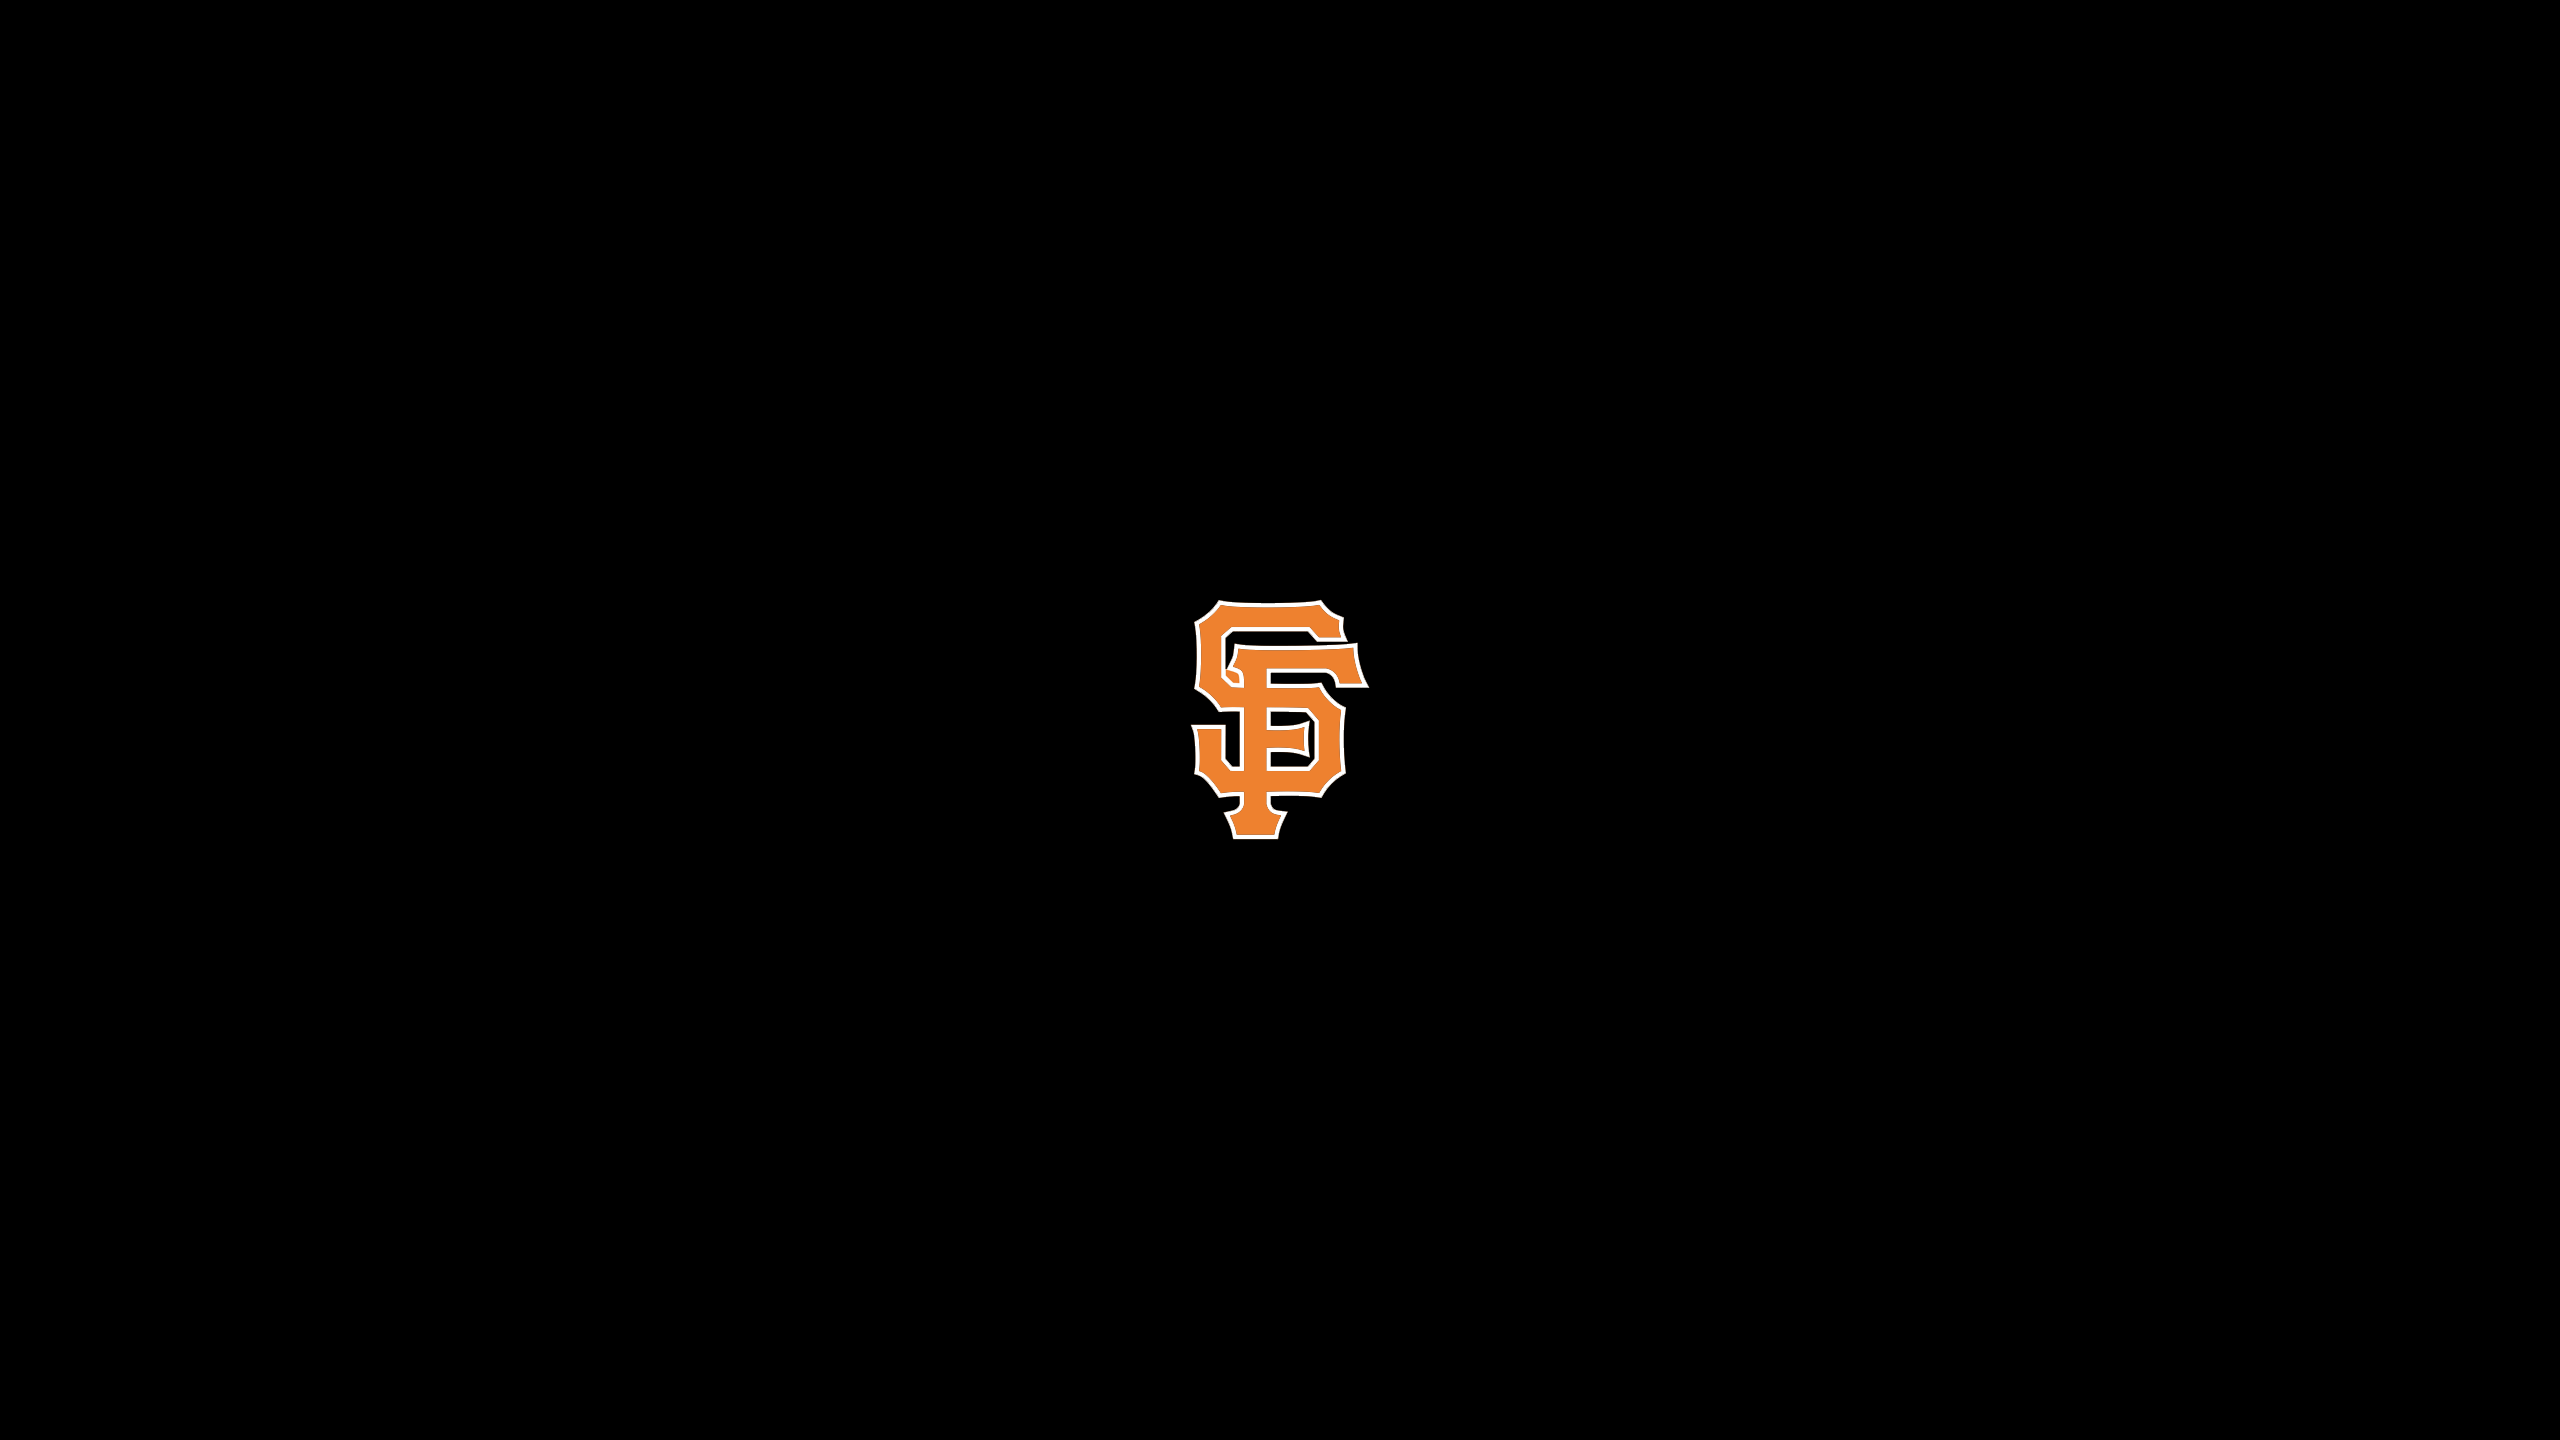 San Francisco Giants Logo Wallpapers 2560x1440